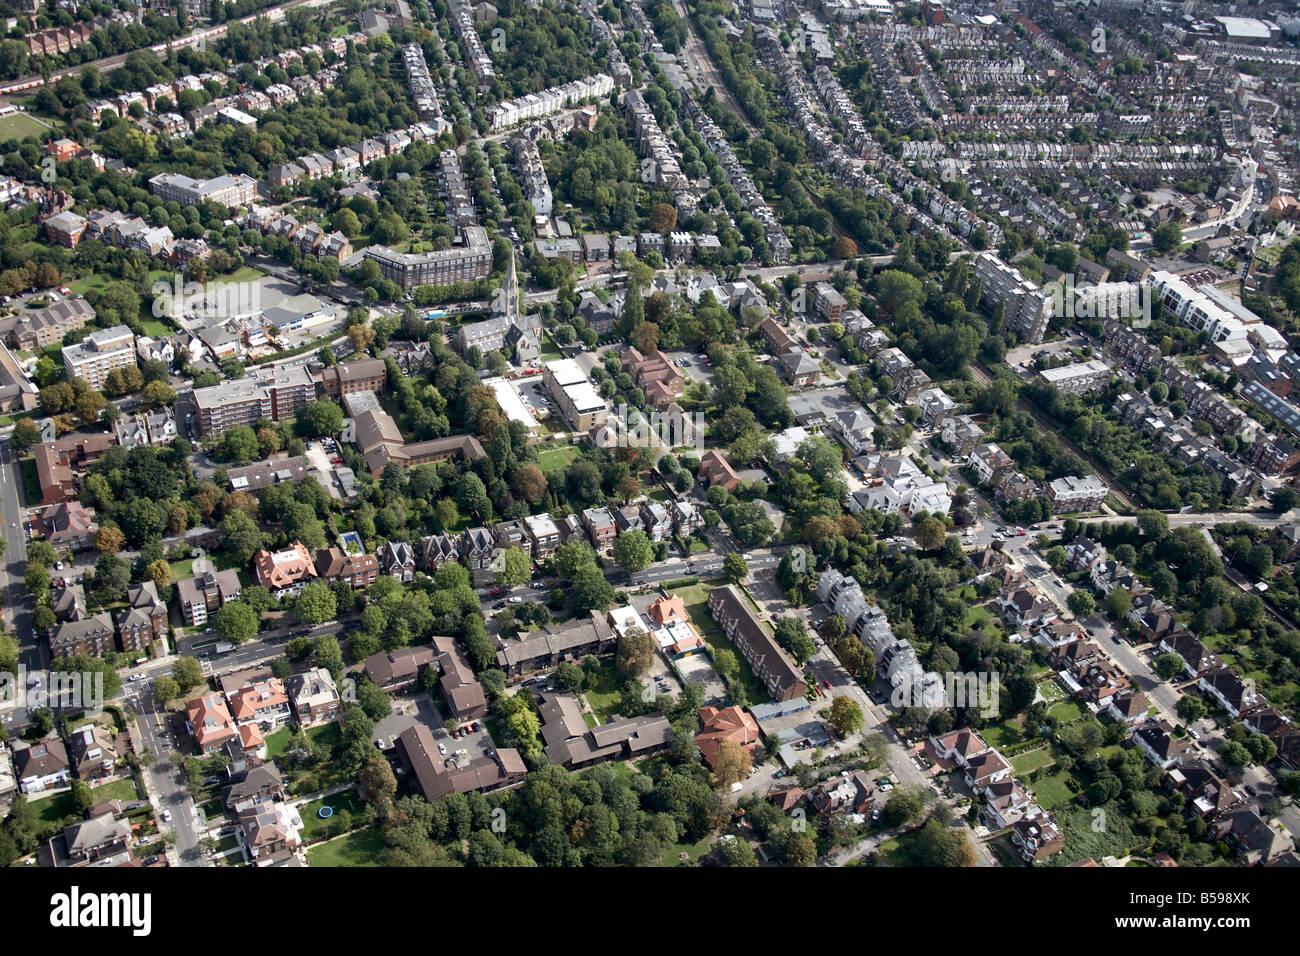 Aerial view north east of suburban houses gardens trees Christ Church Willesden Lane Salusbury Road Brondesbury - Stock Image